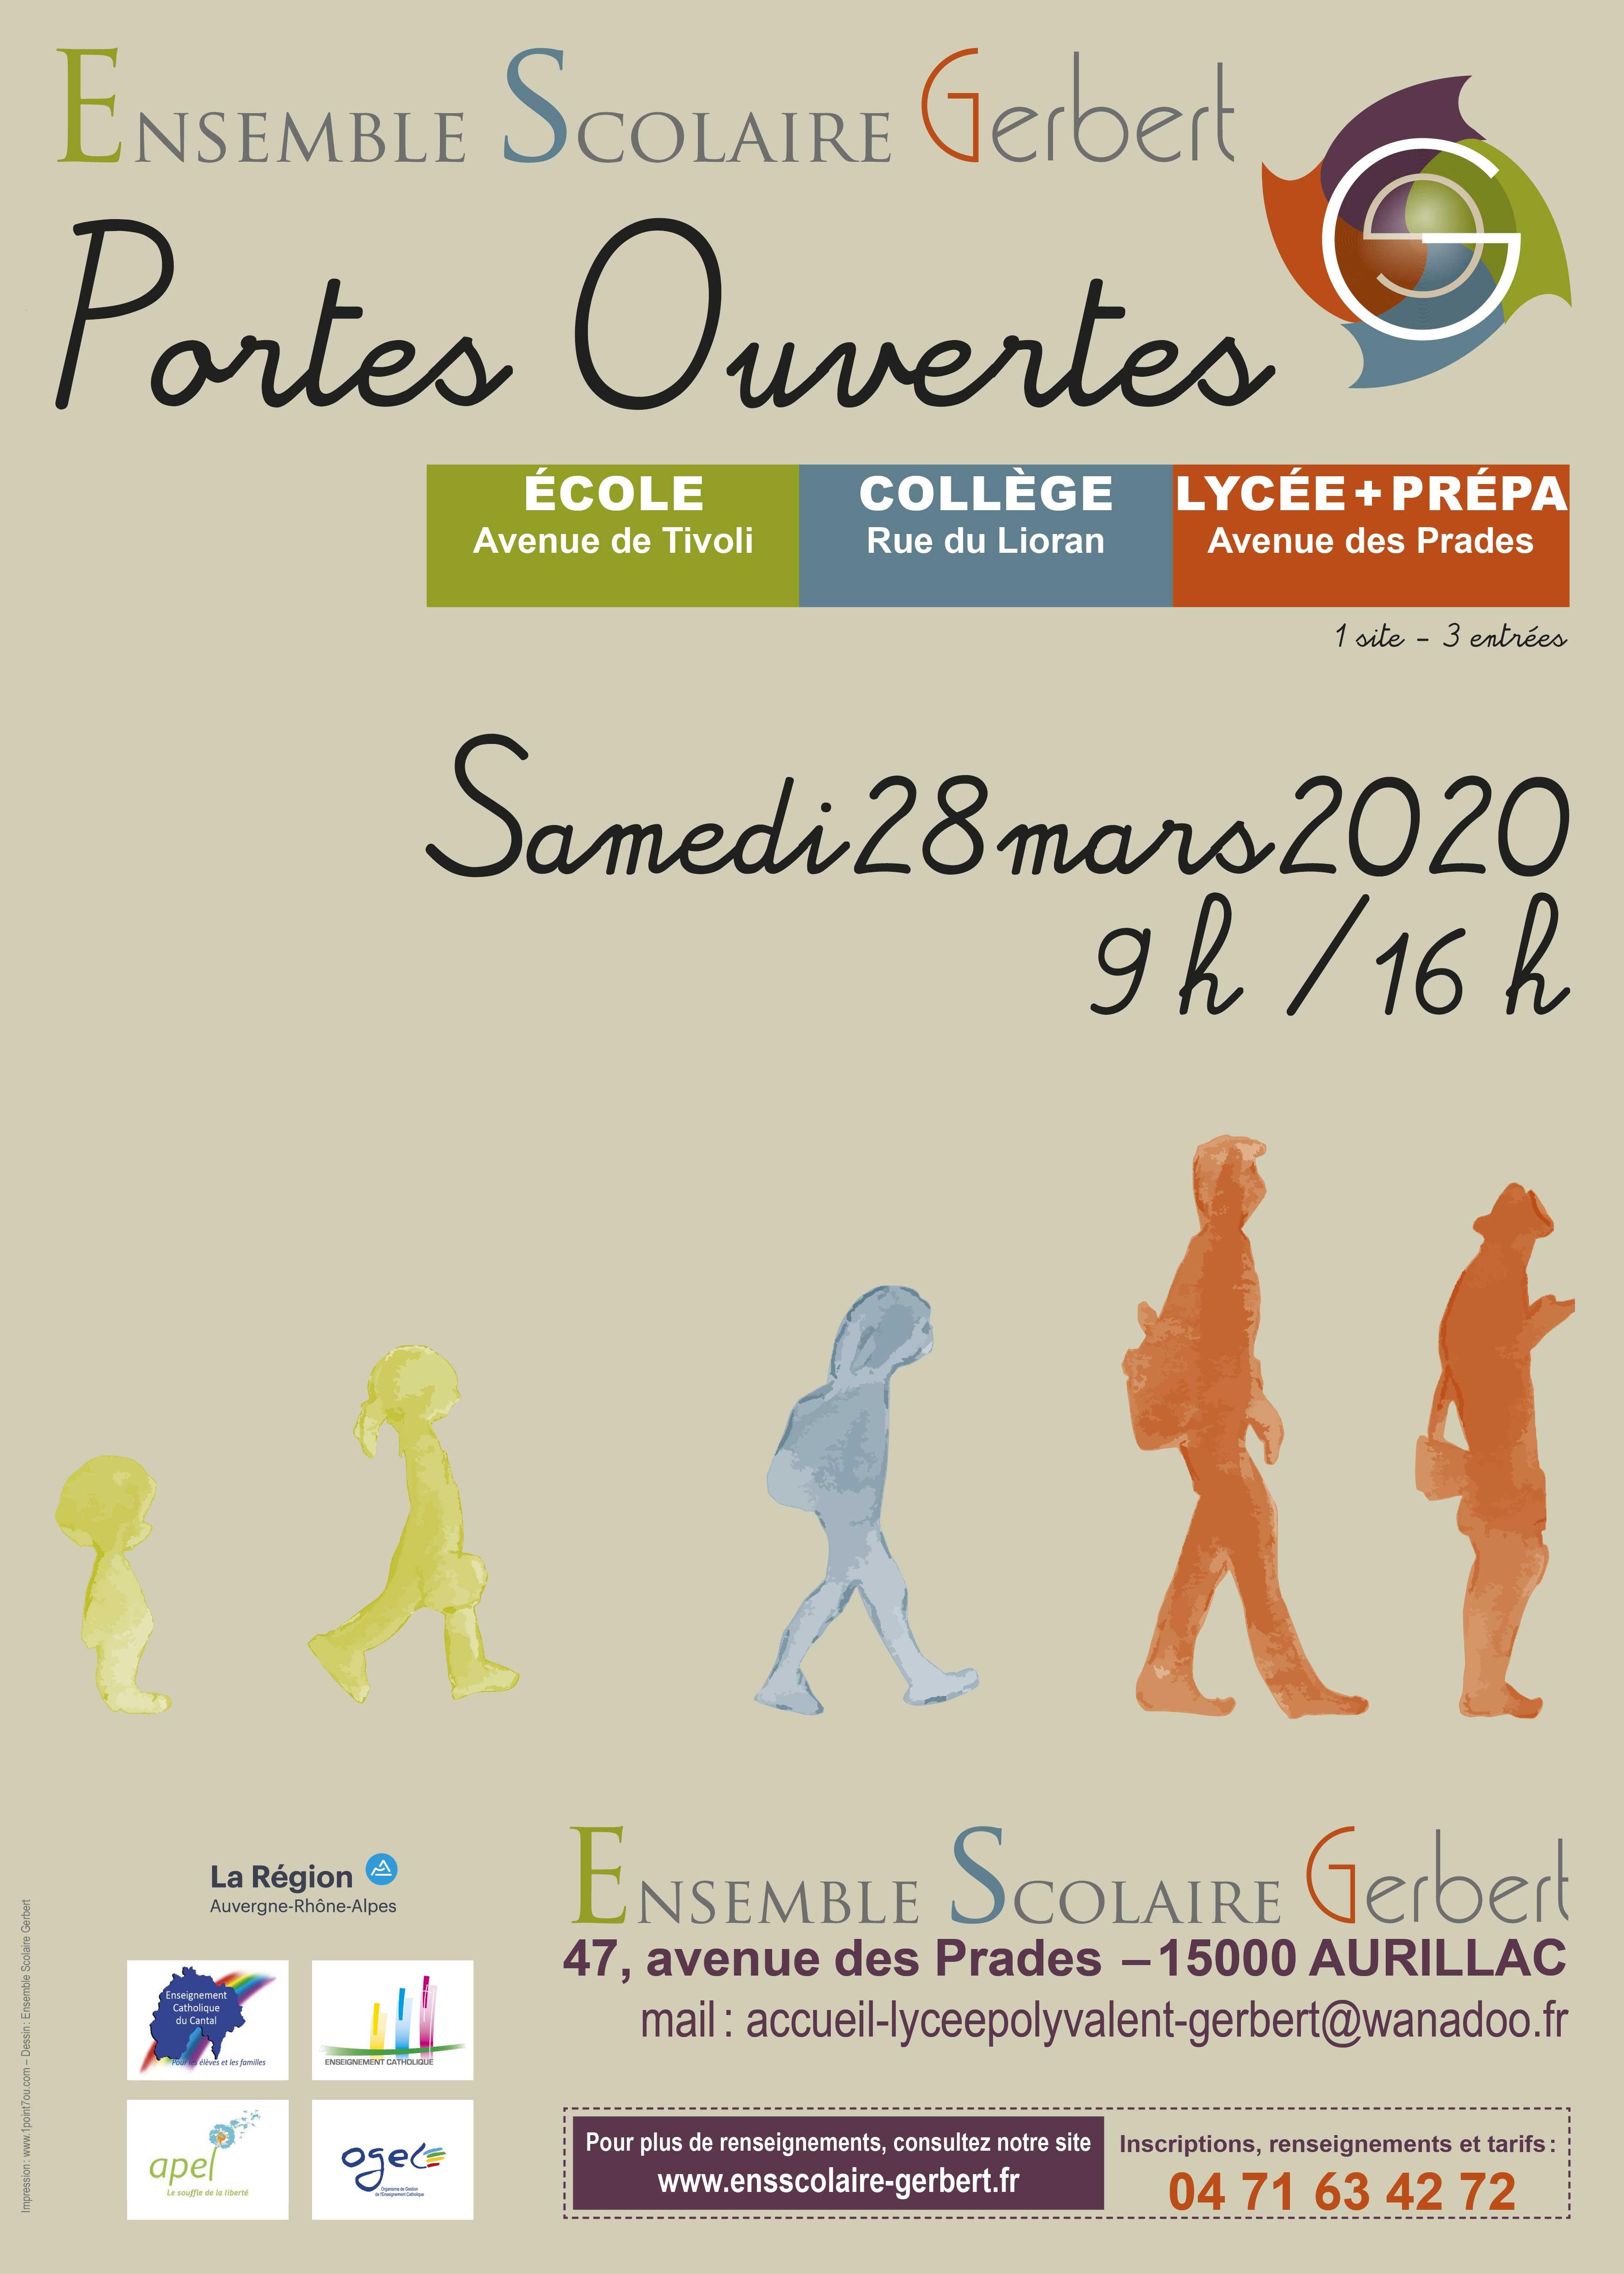 Ensemble Scolaire Gerbert - Portes ouvertes - Samedi 28 mars 2020